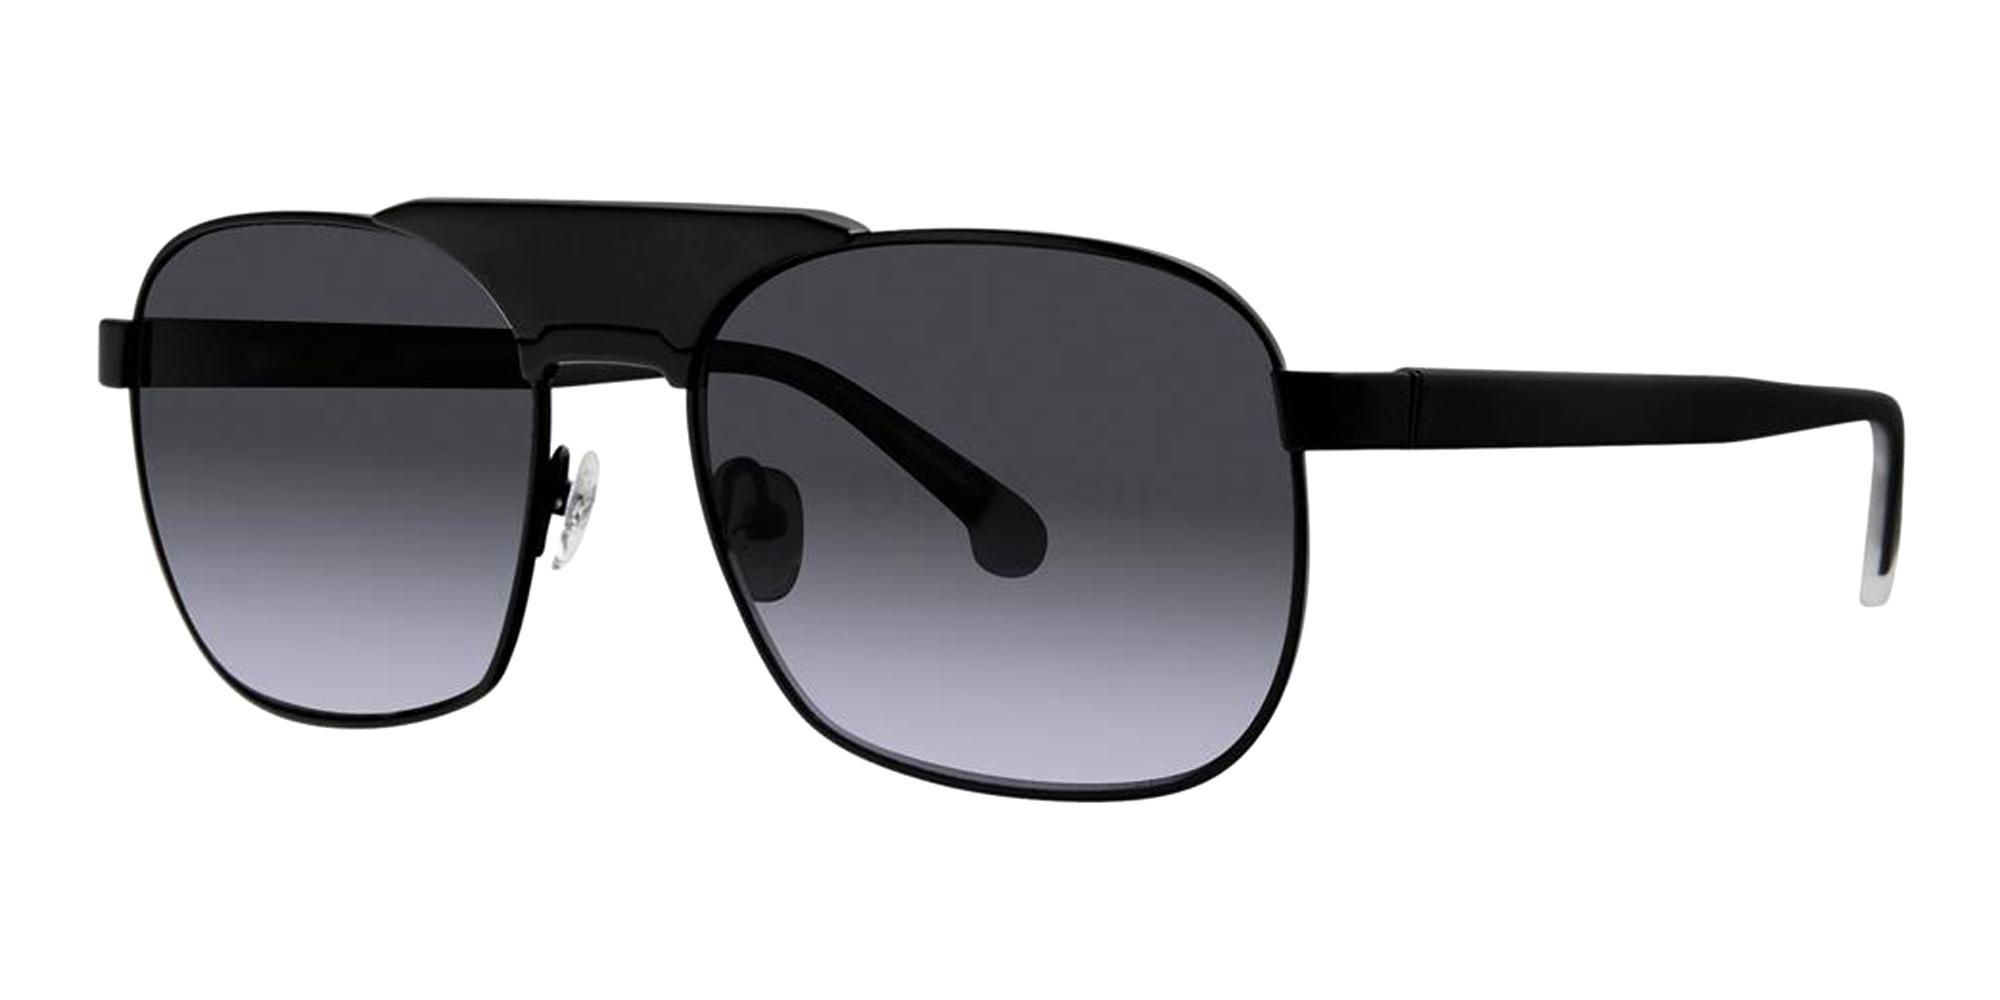 Black THE CONLEY Sunglasses, Original Penguin